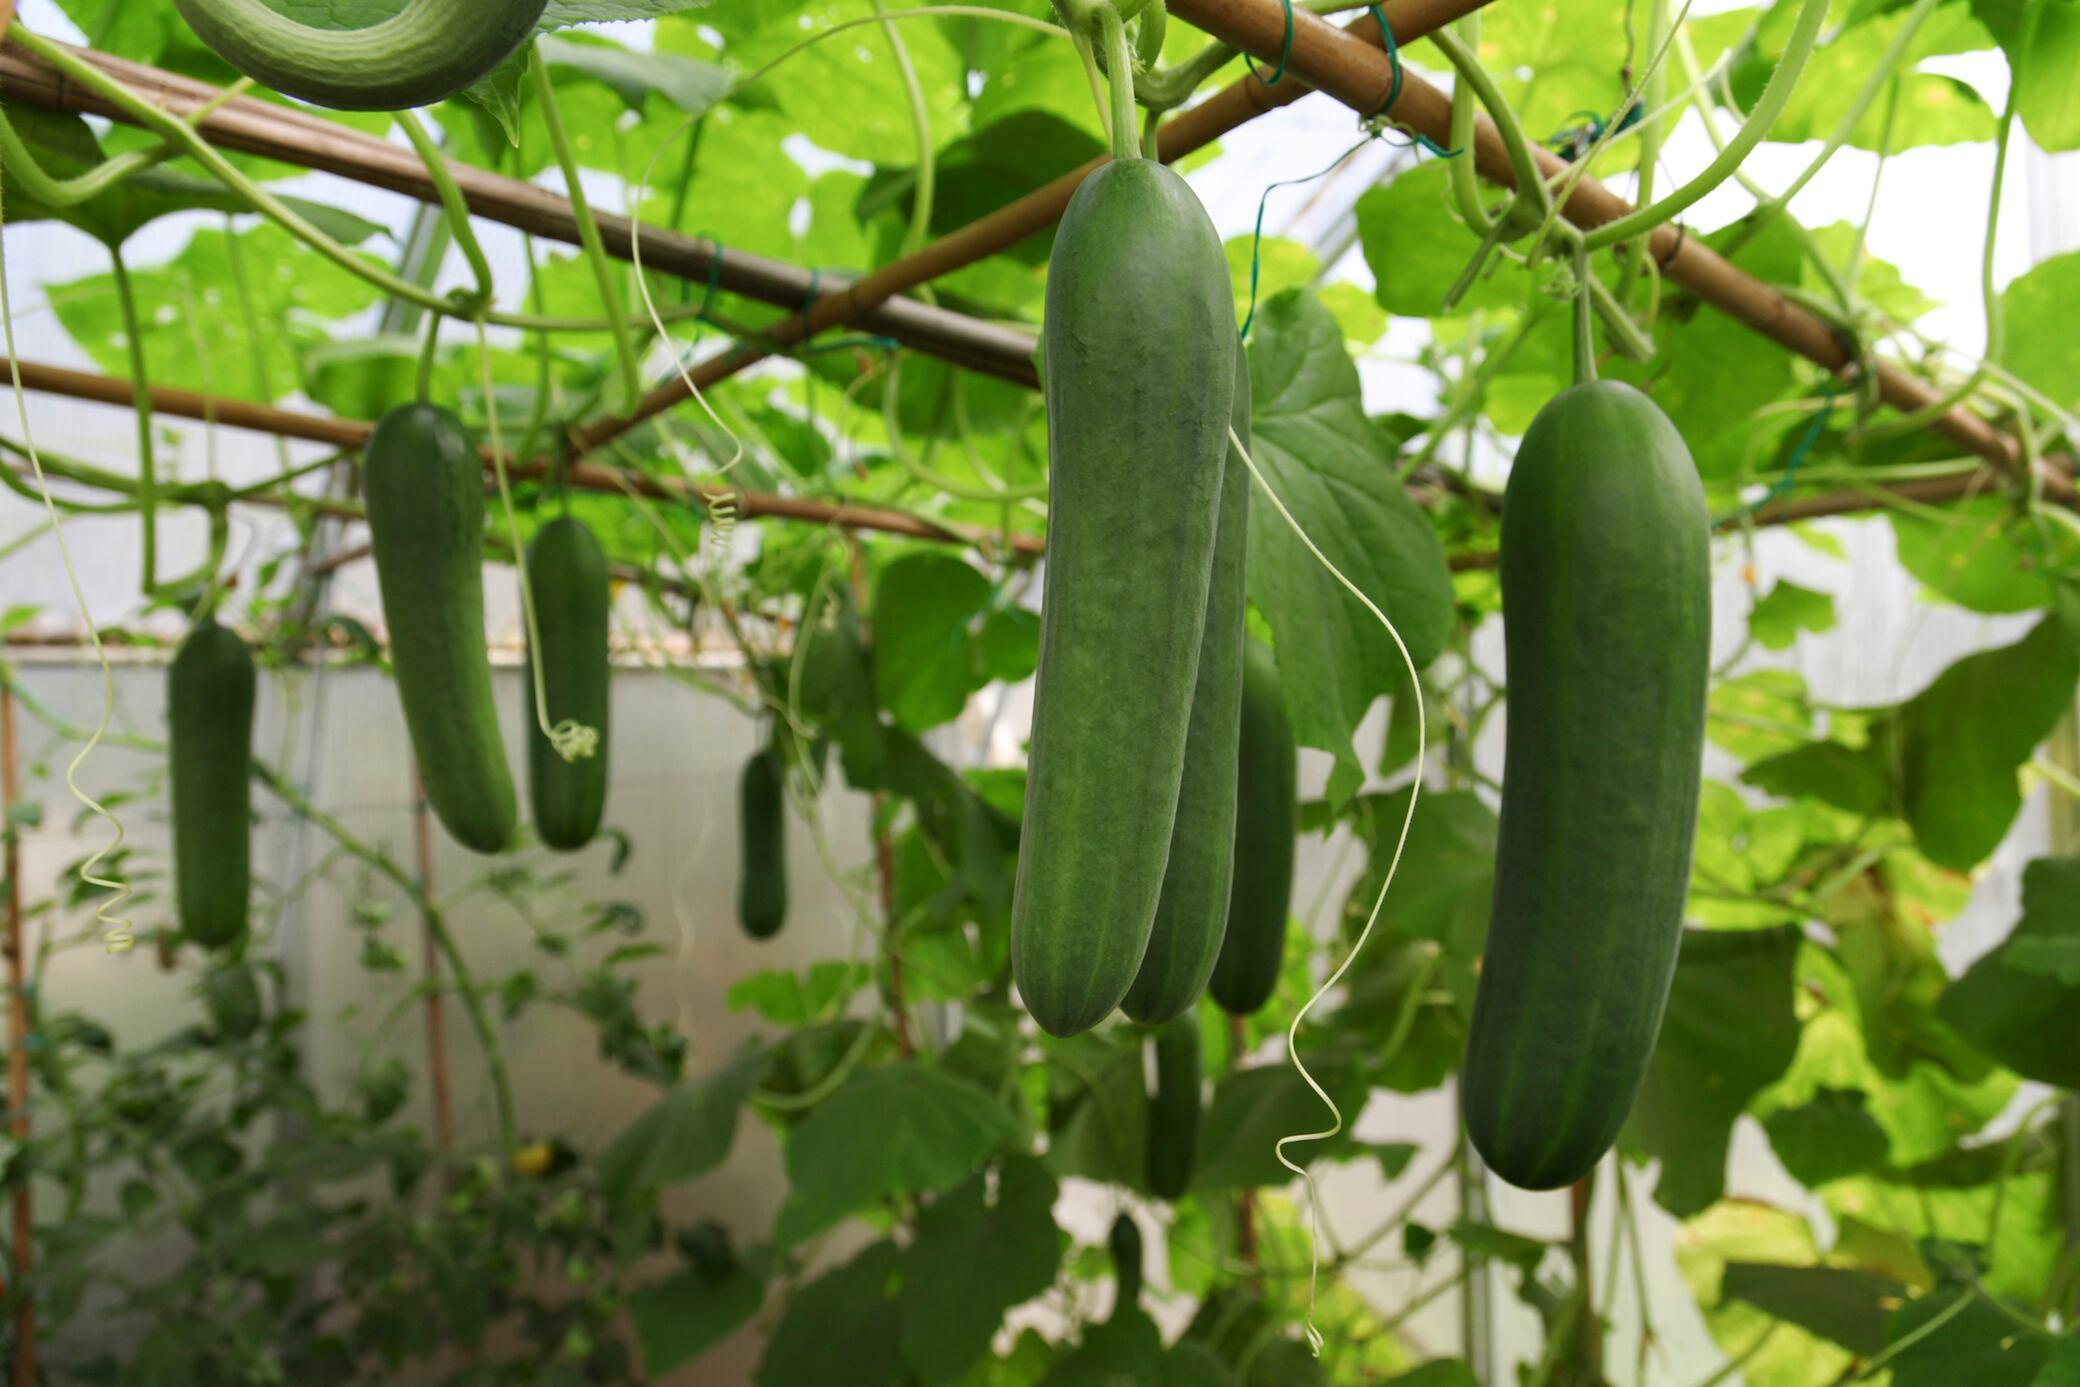 Gurkenpflanzen